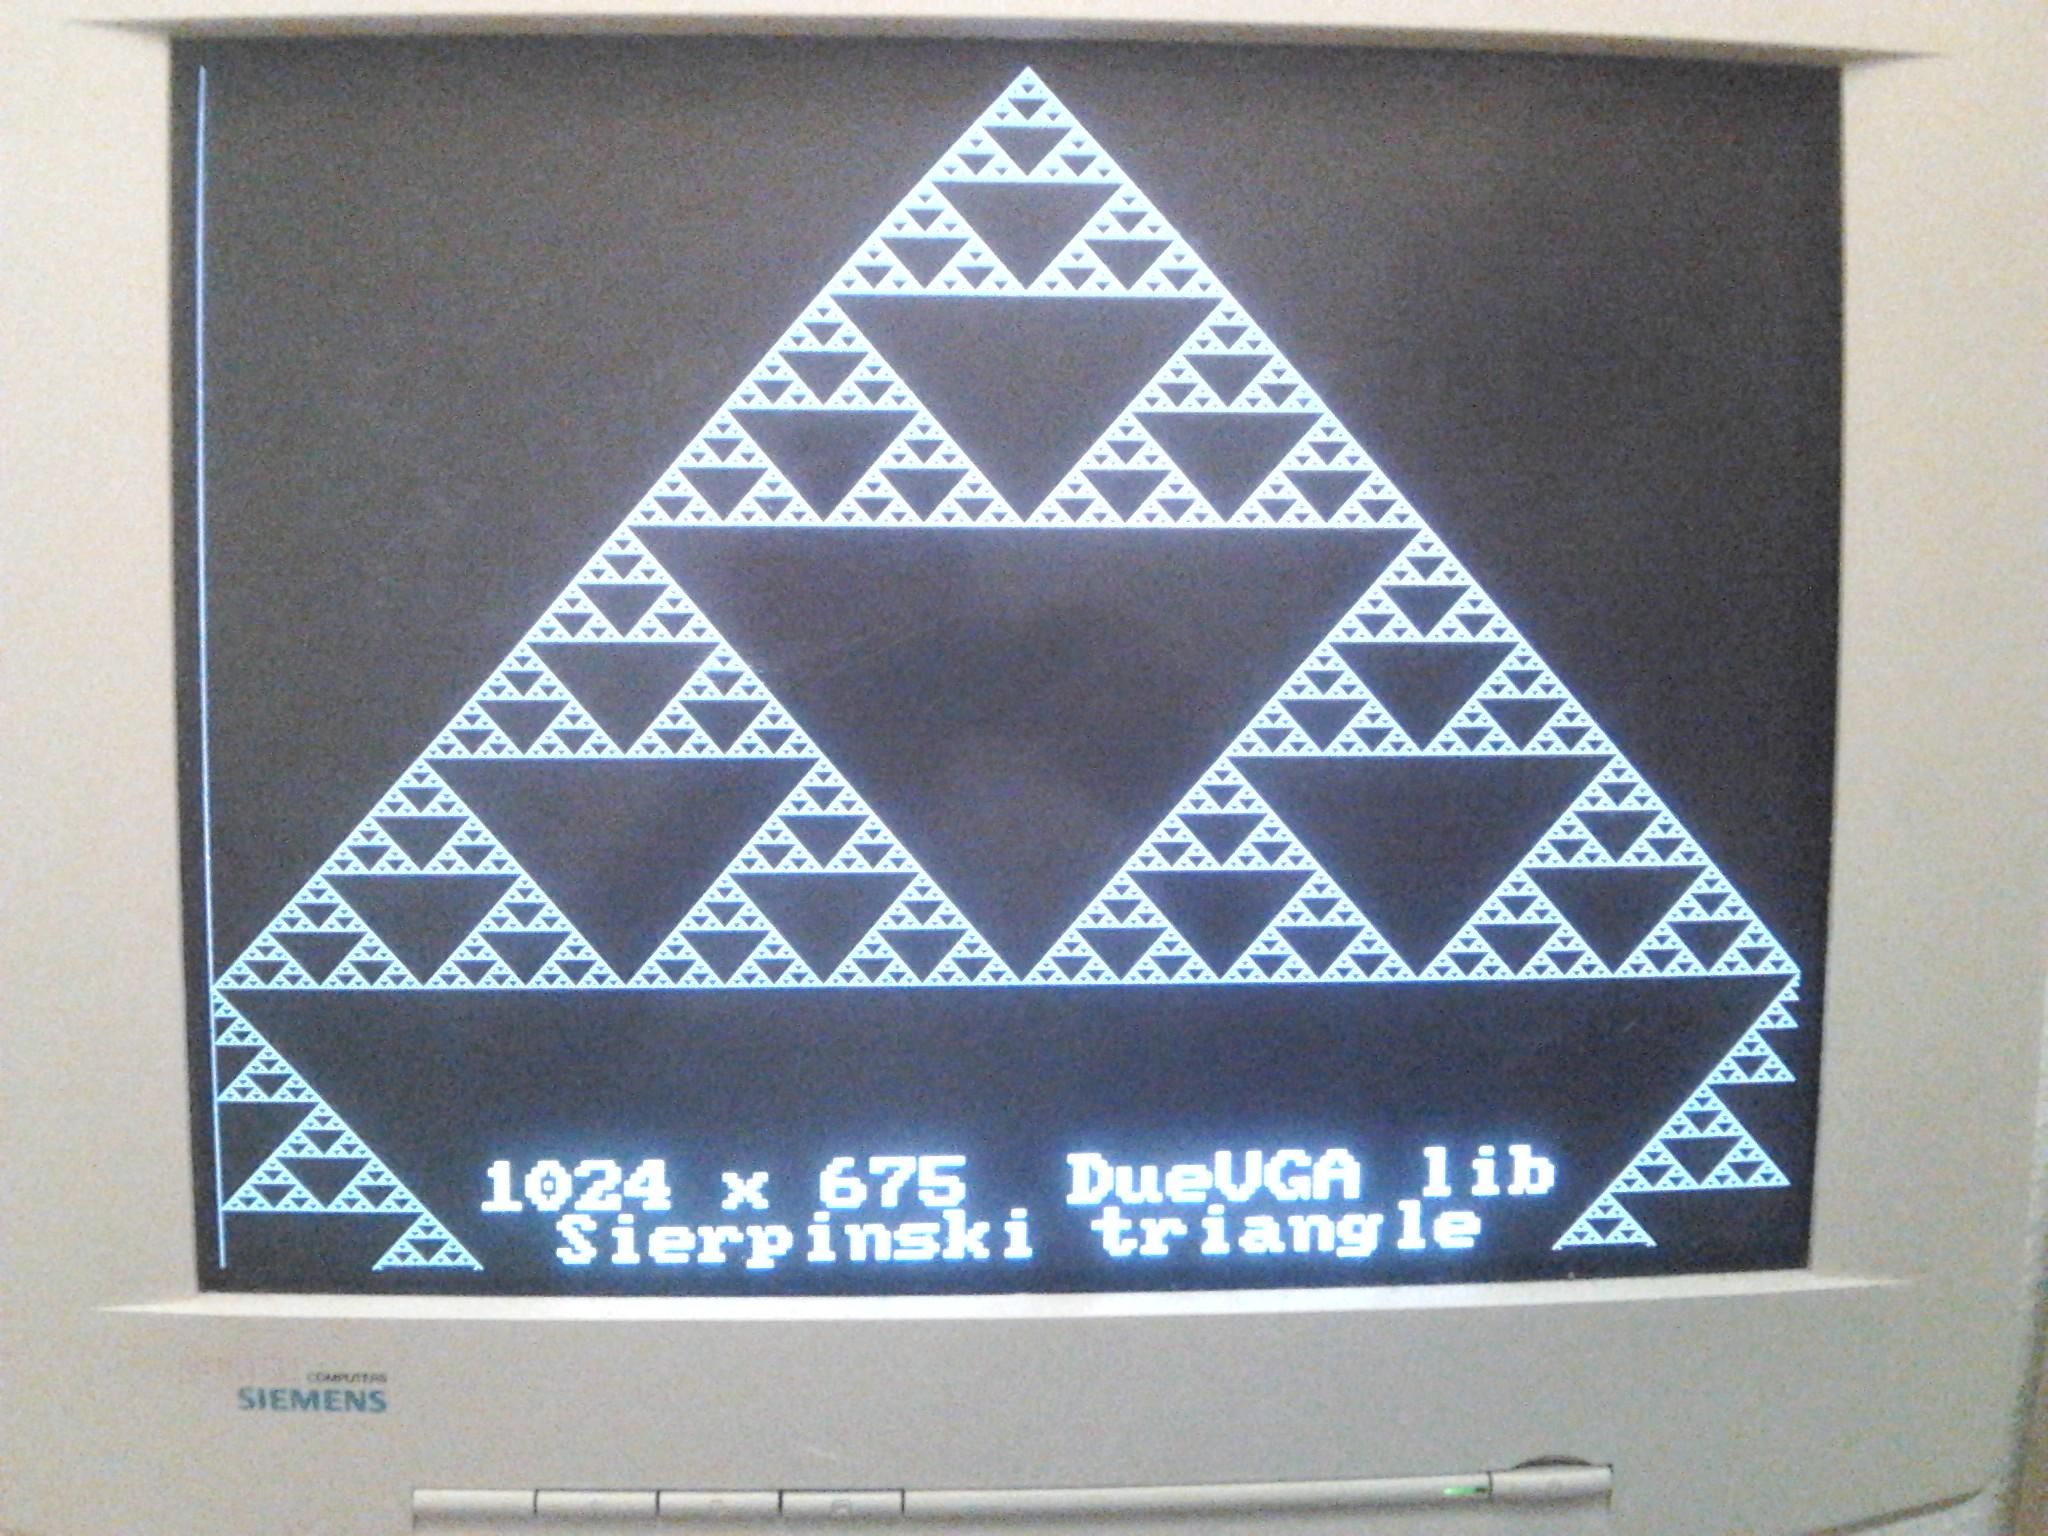  500x375